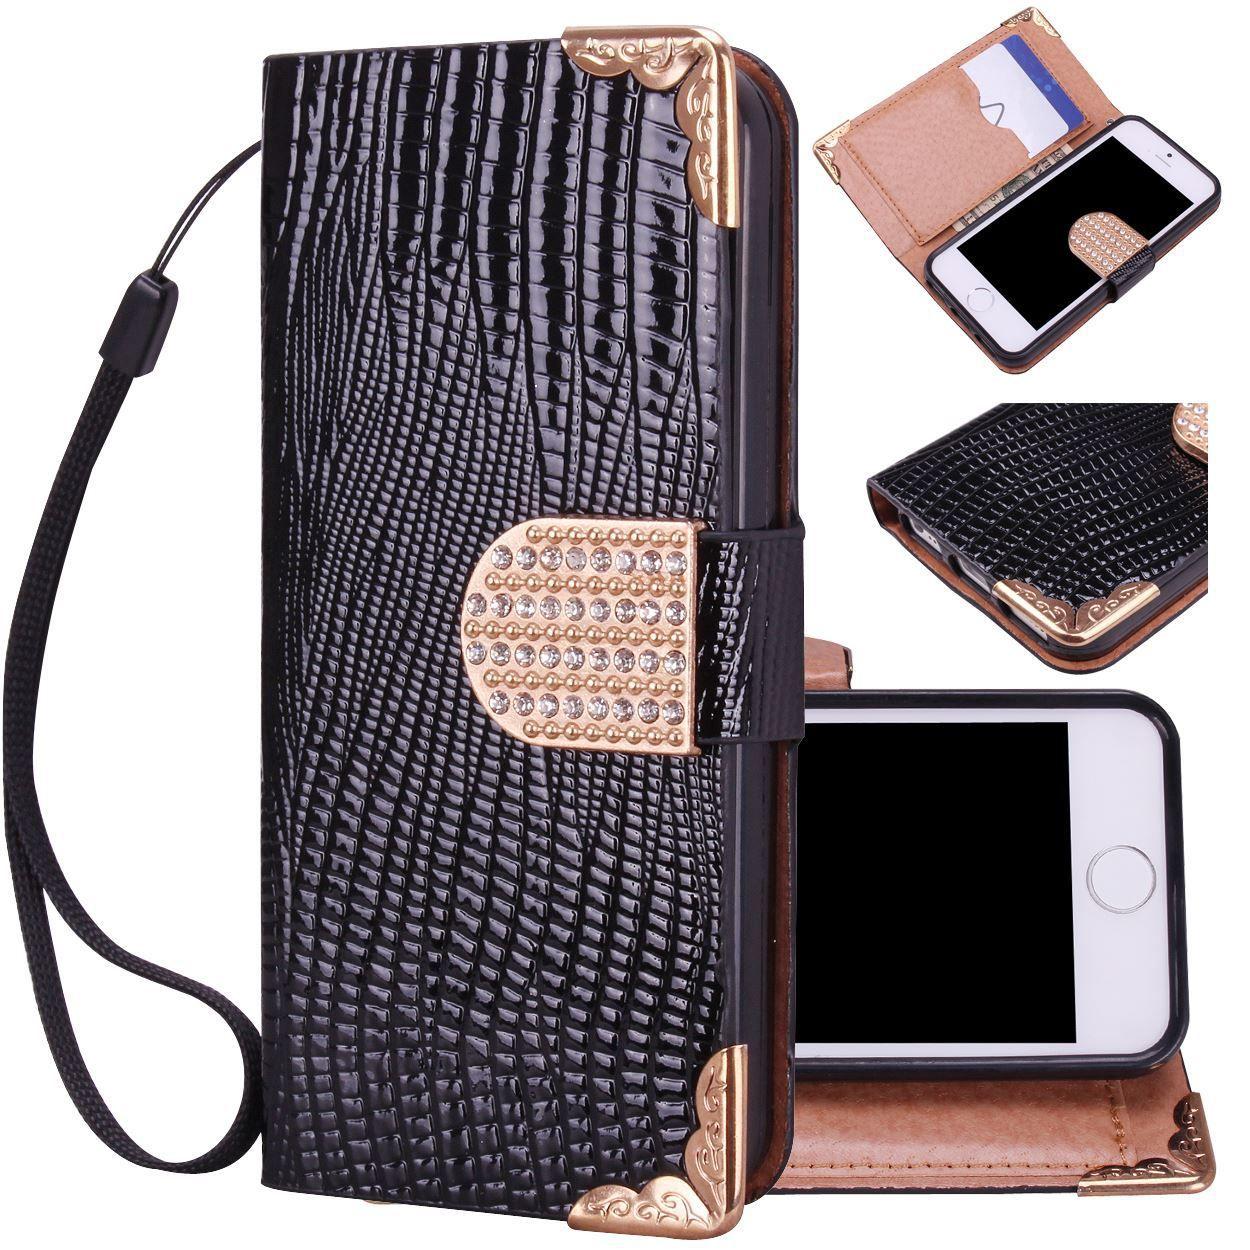 Deluxe Bling Fancy Wristlet Wallet Case for iPhone 5/s